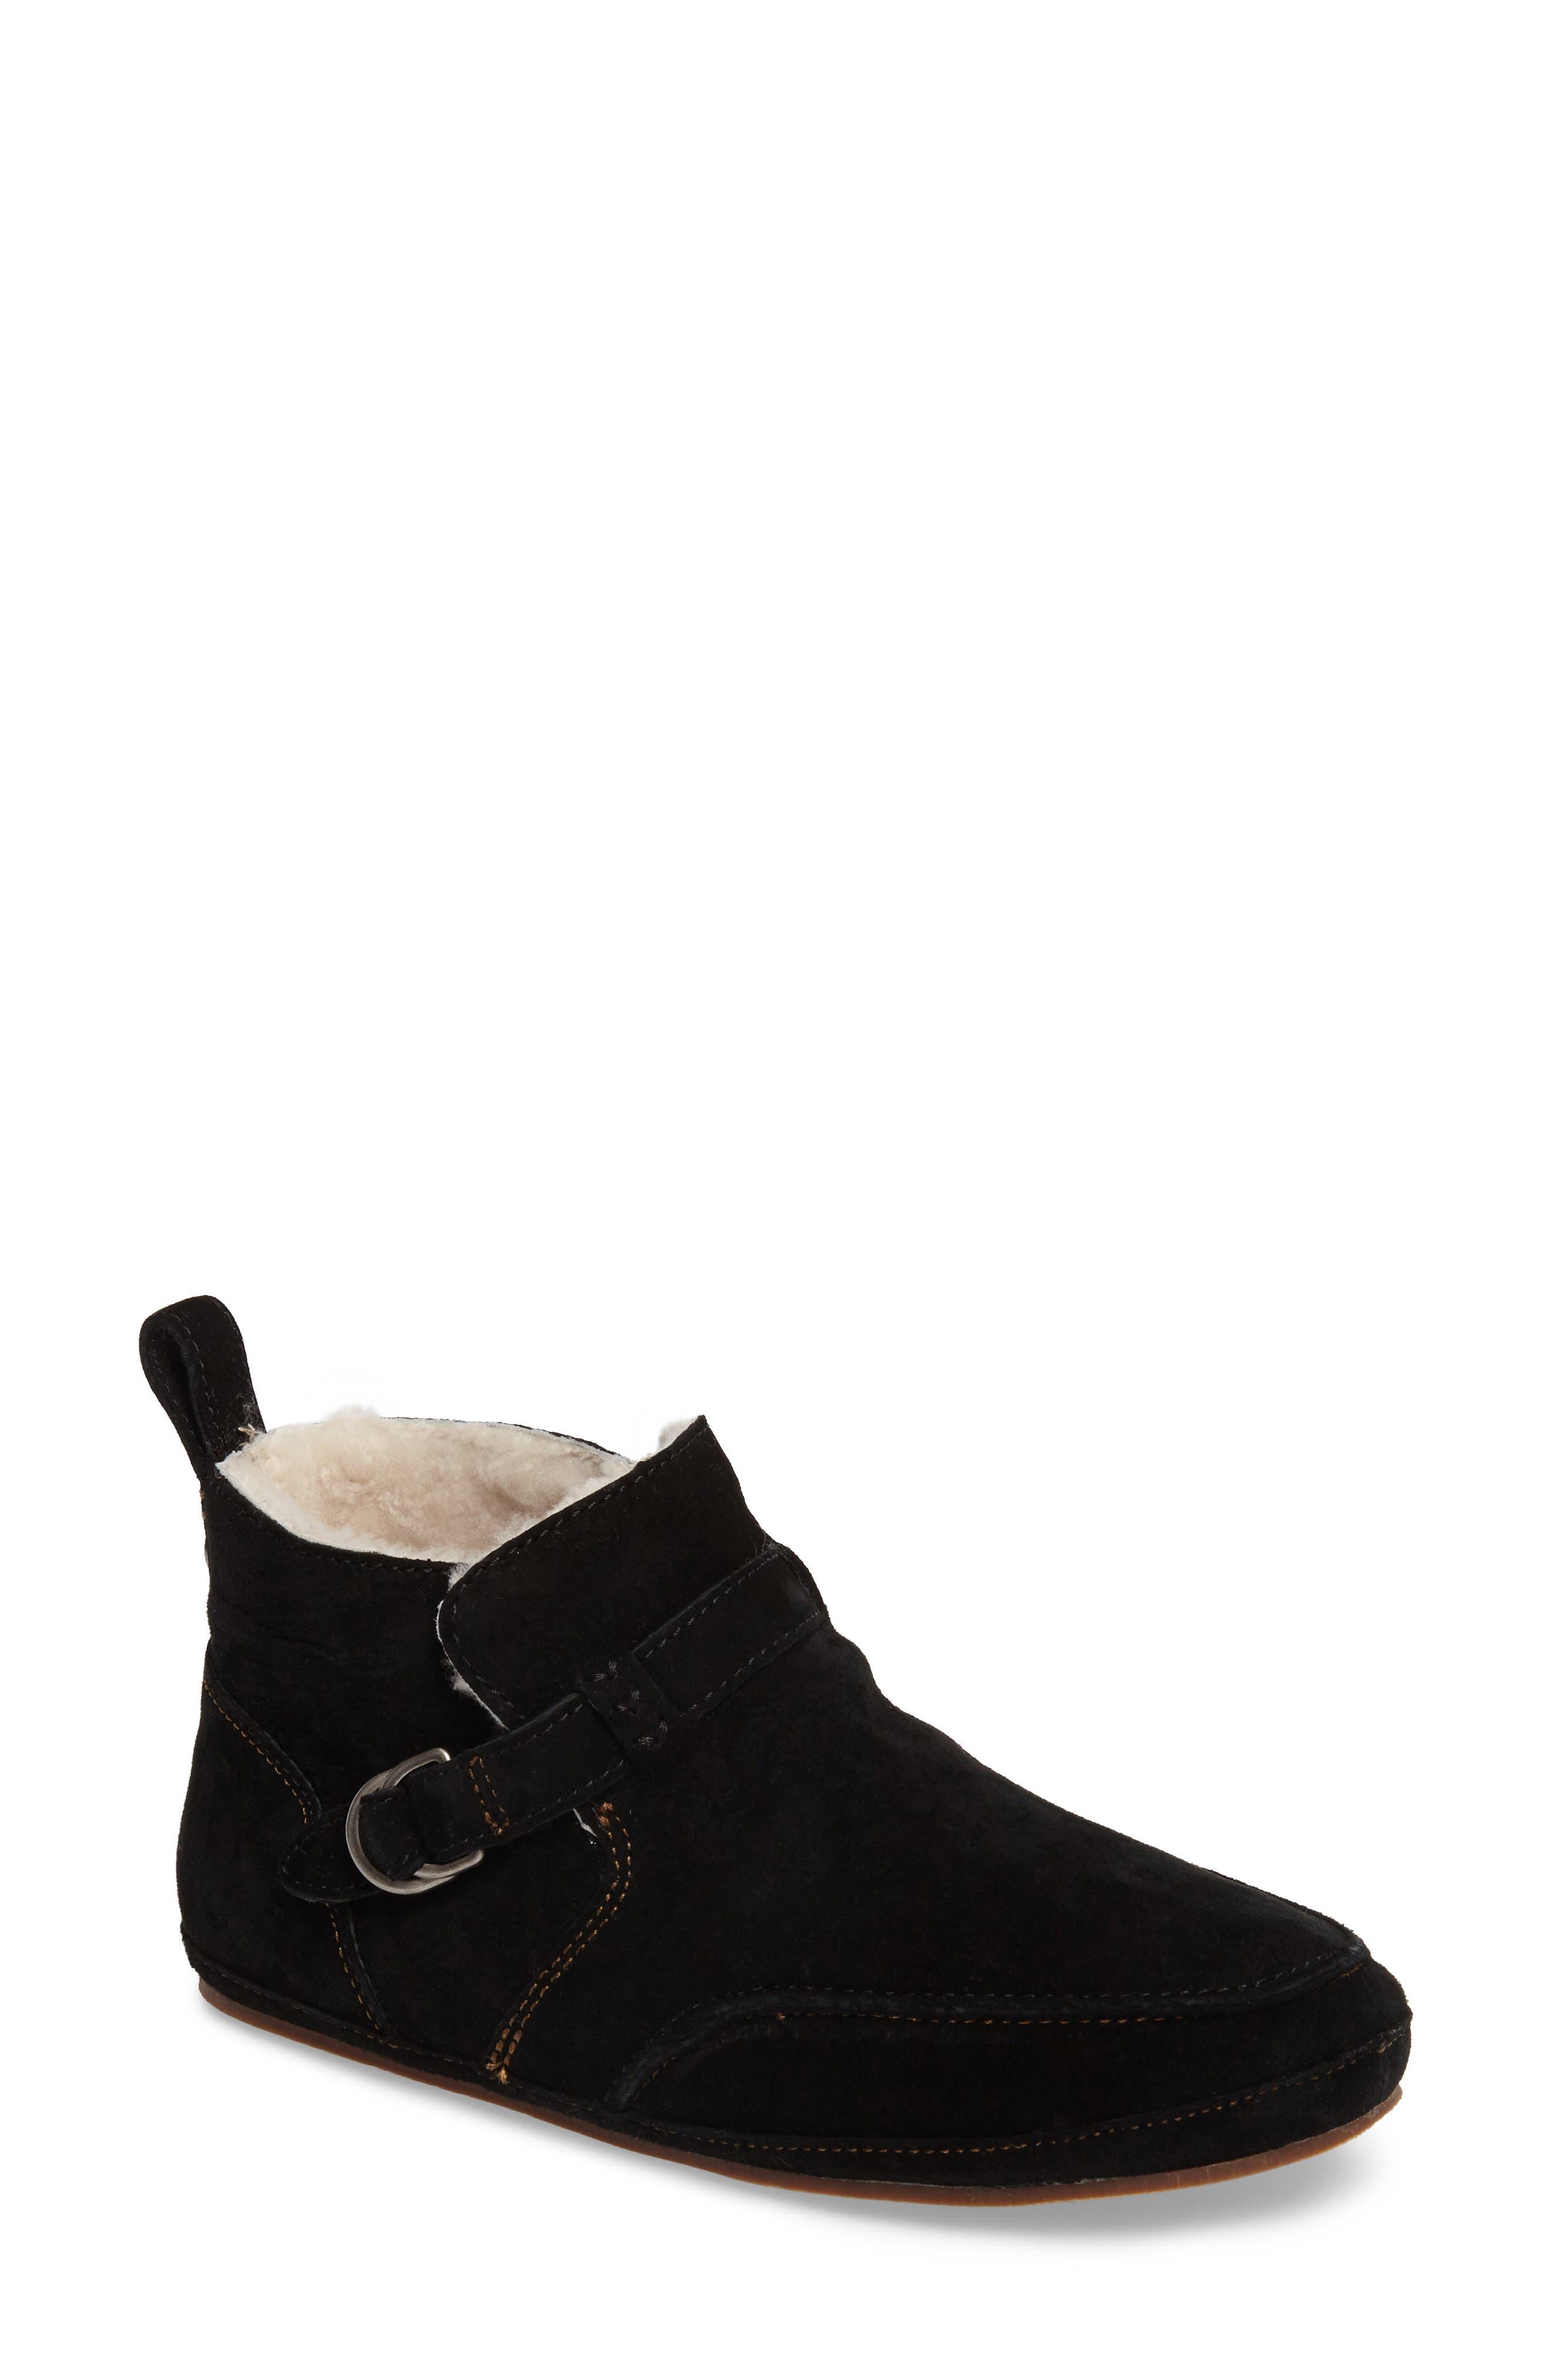 Ola Hou Genuine Shearling Bootie,                         Main,                         color, BLACK/ BLACK LEATHER